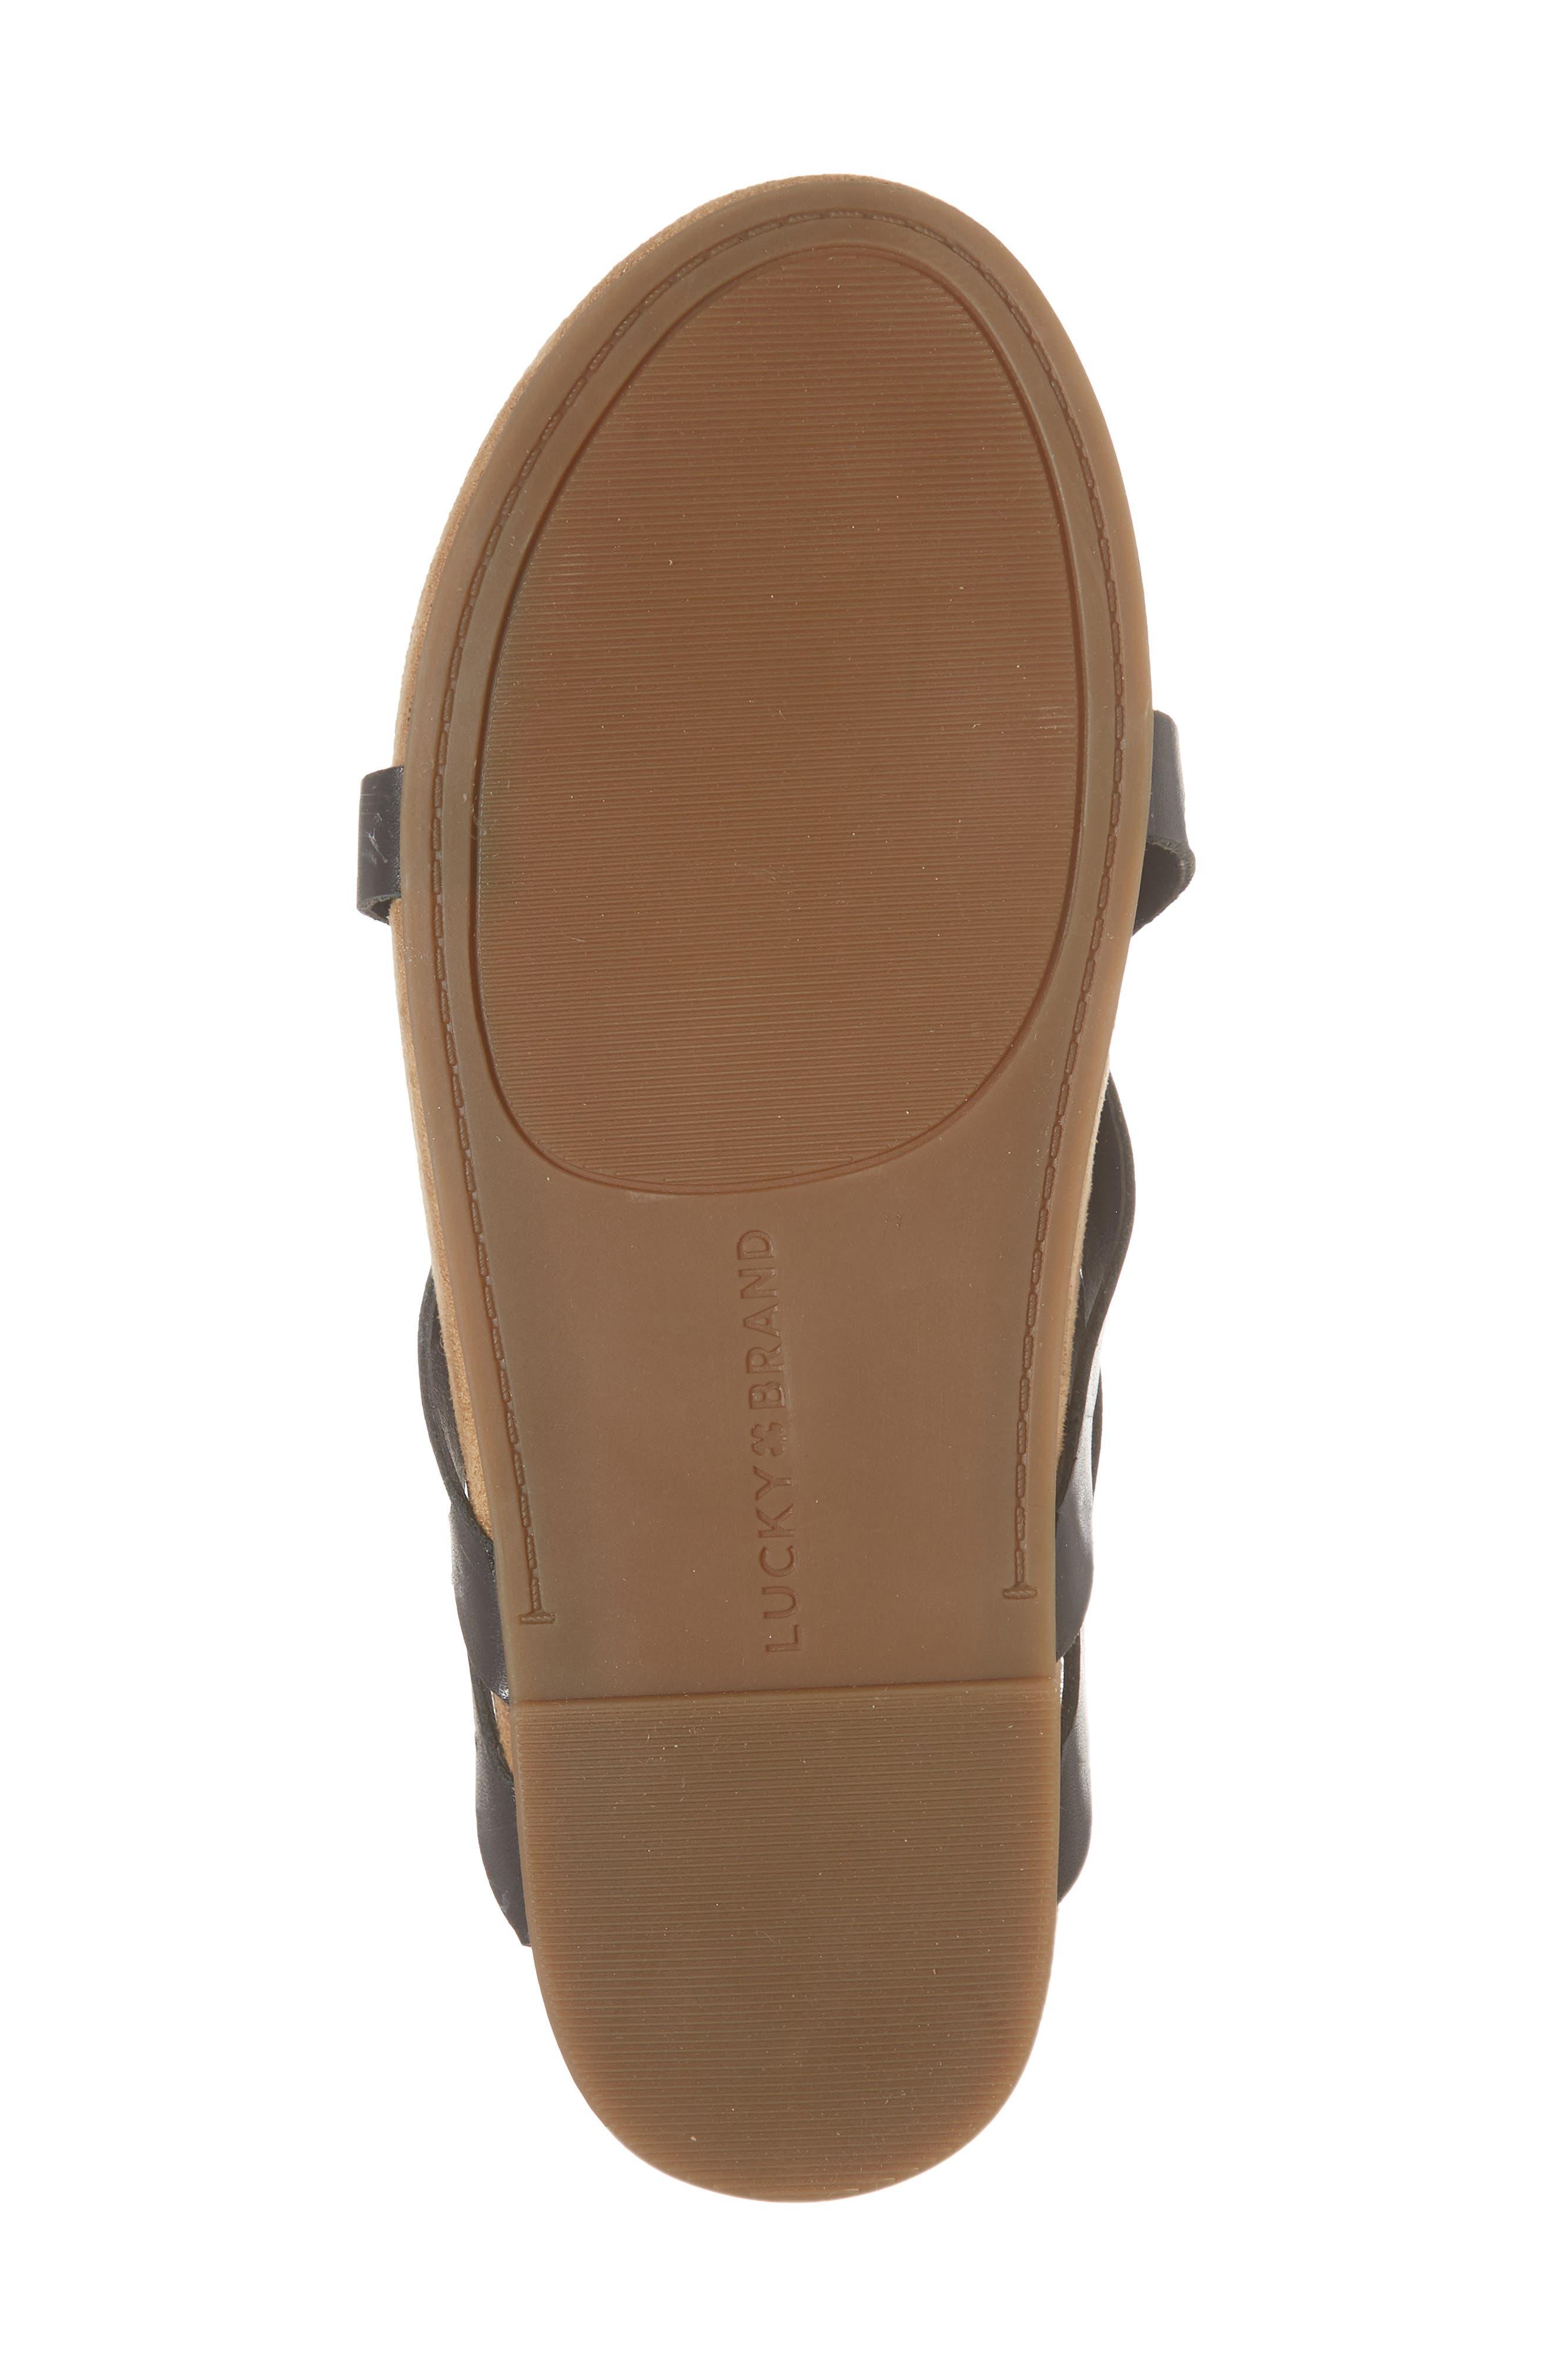 Fillima Flip Flop,                             Alternate thumbnail 6, color,                             Black Leather